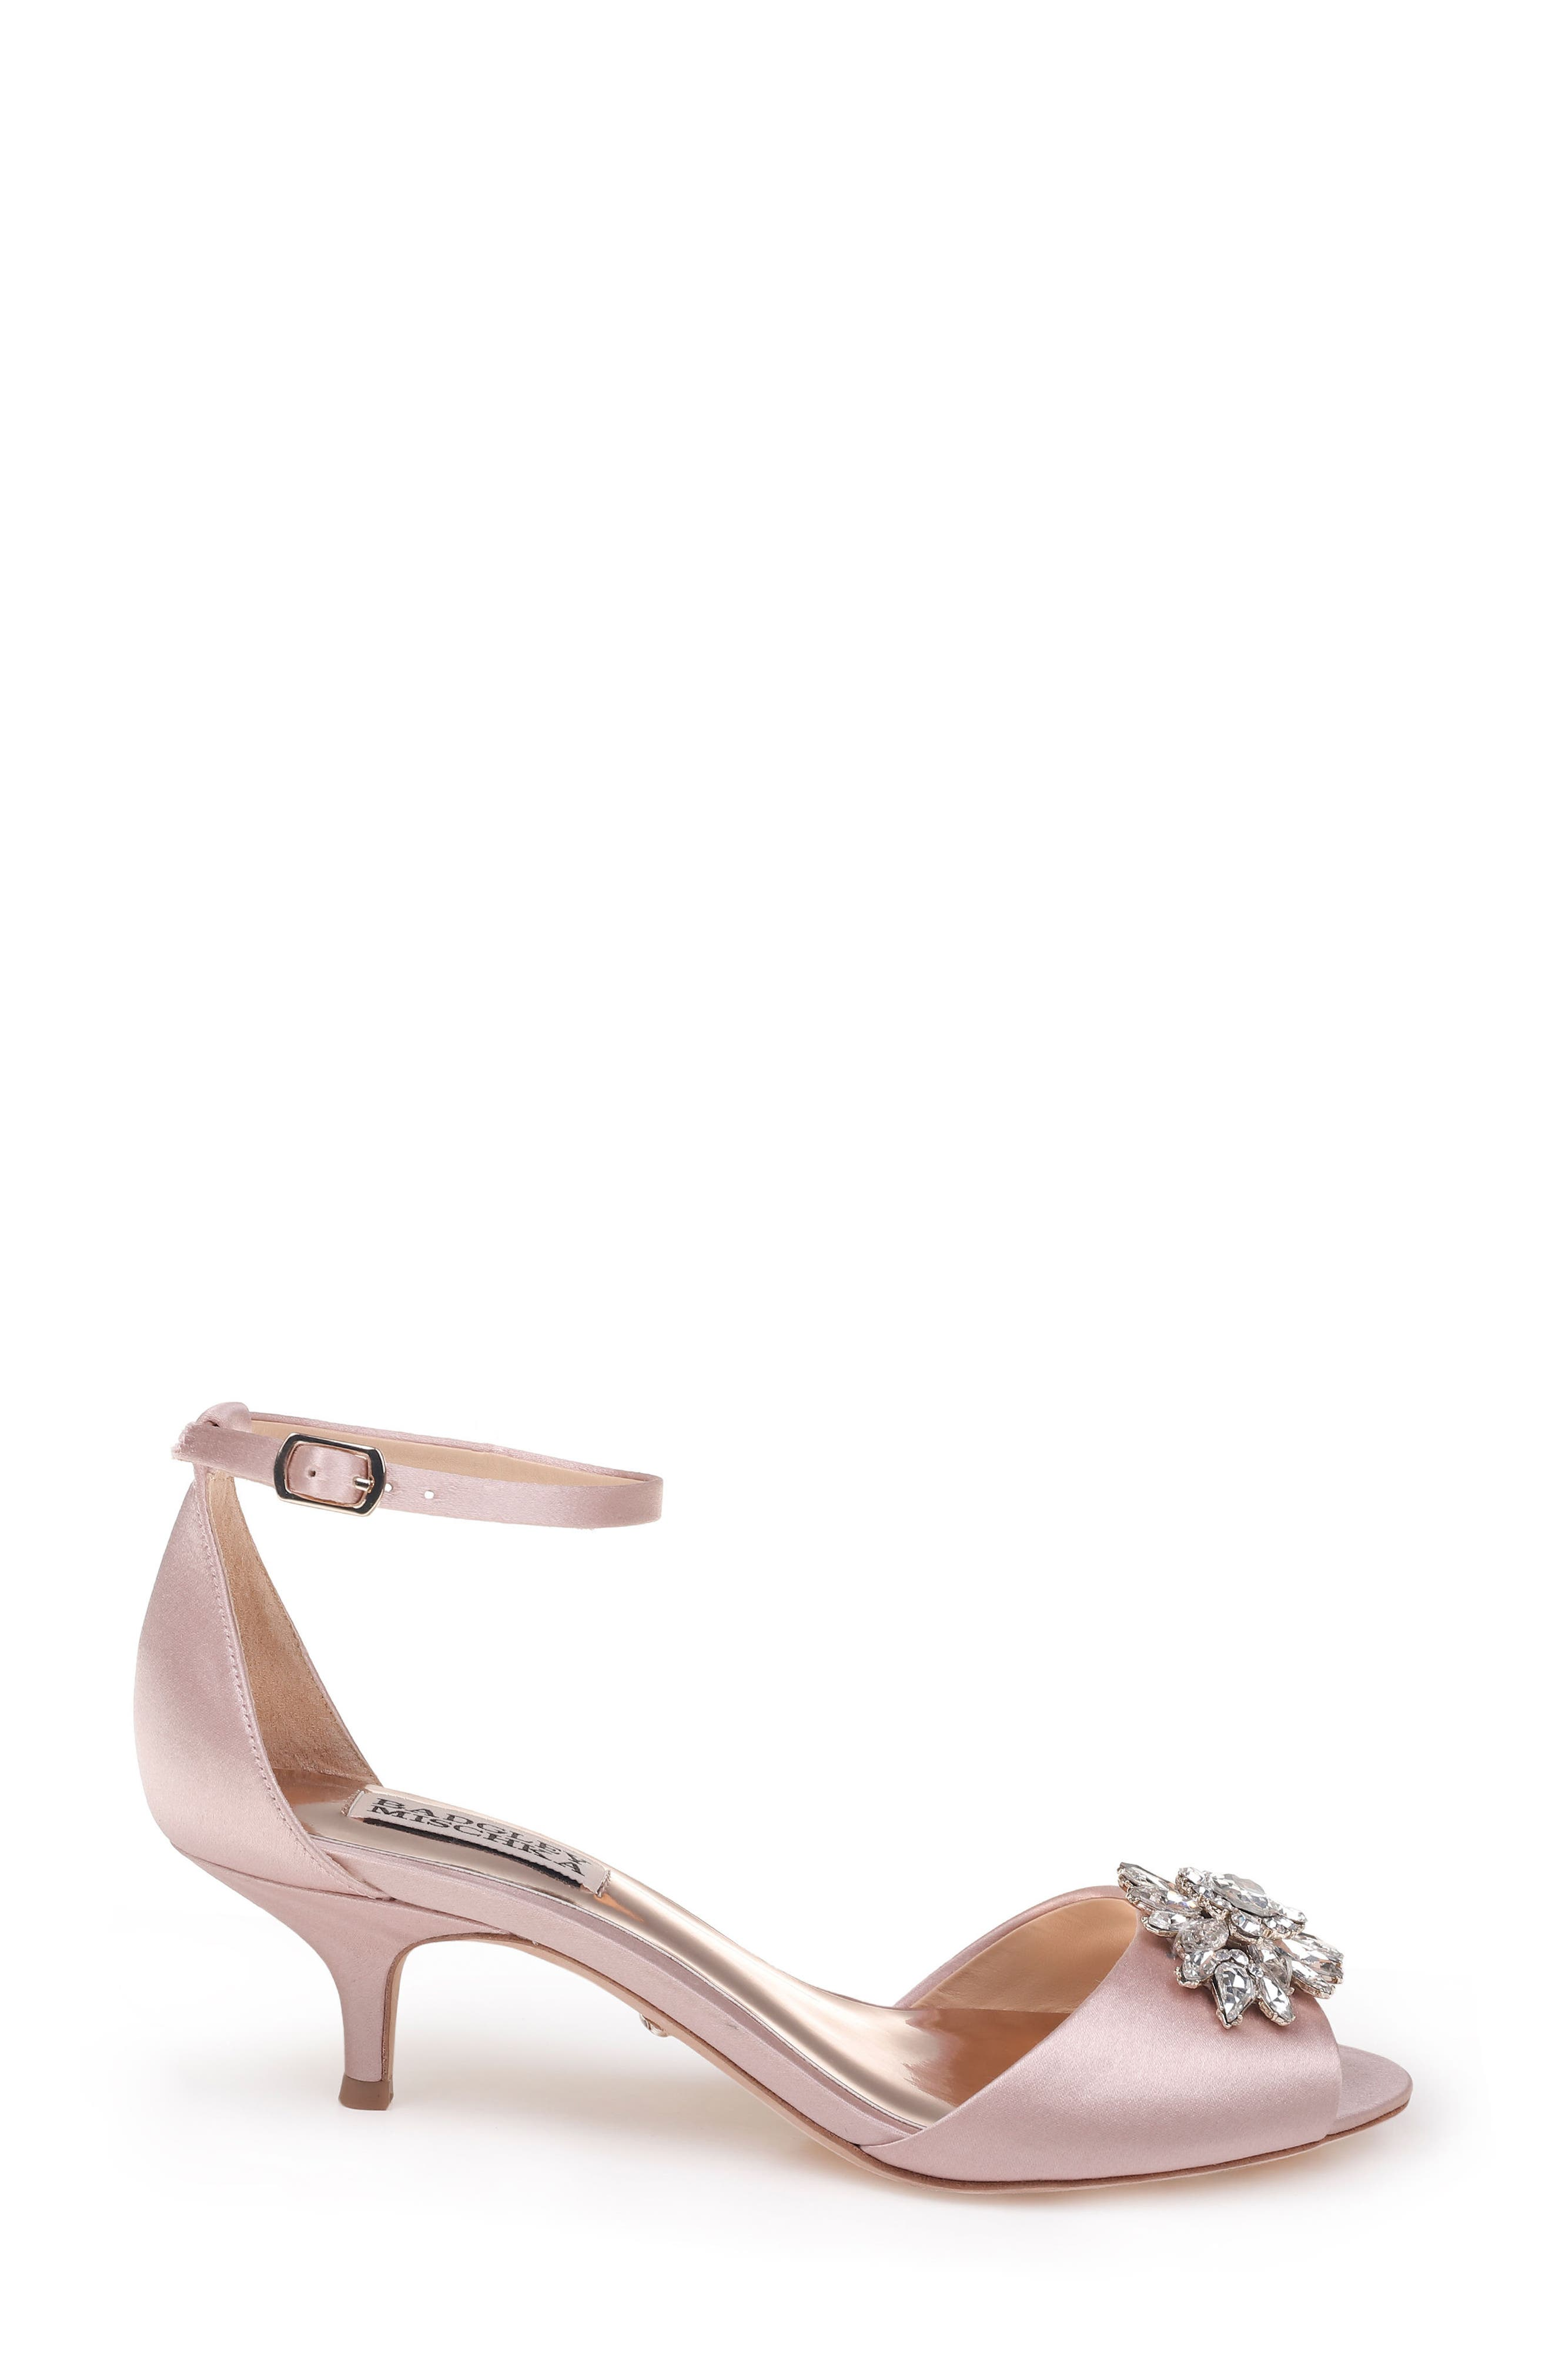 Alternate Image 3  - Badgley Mischka Sainte Crystal Embellished Sandal (Women)